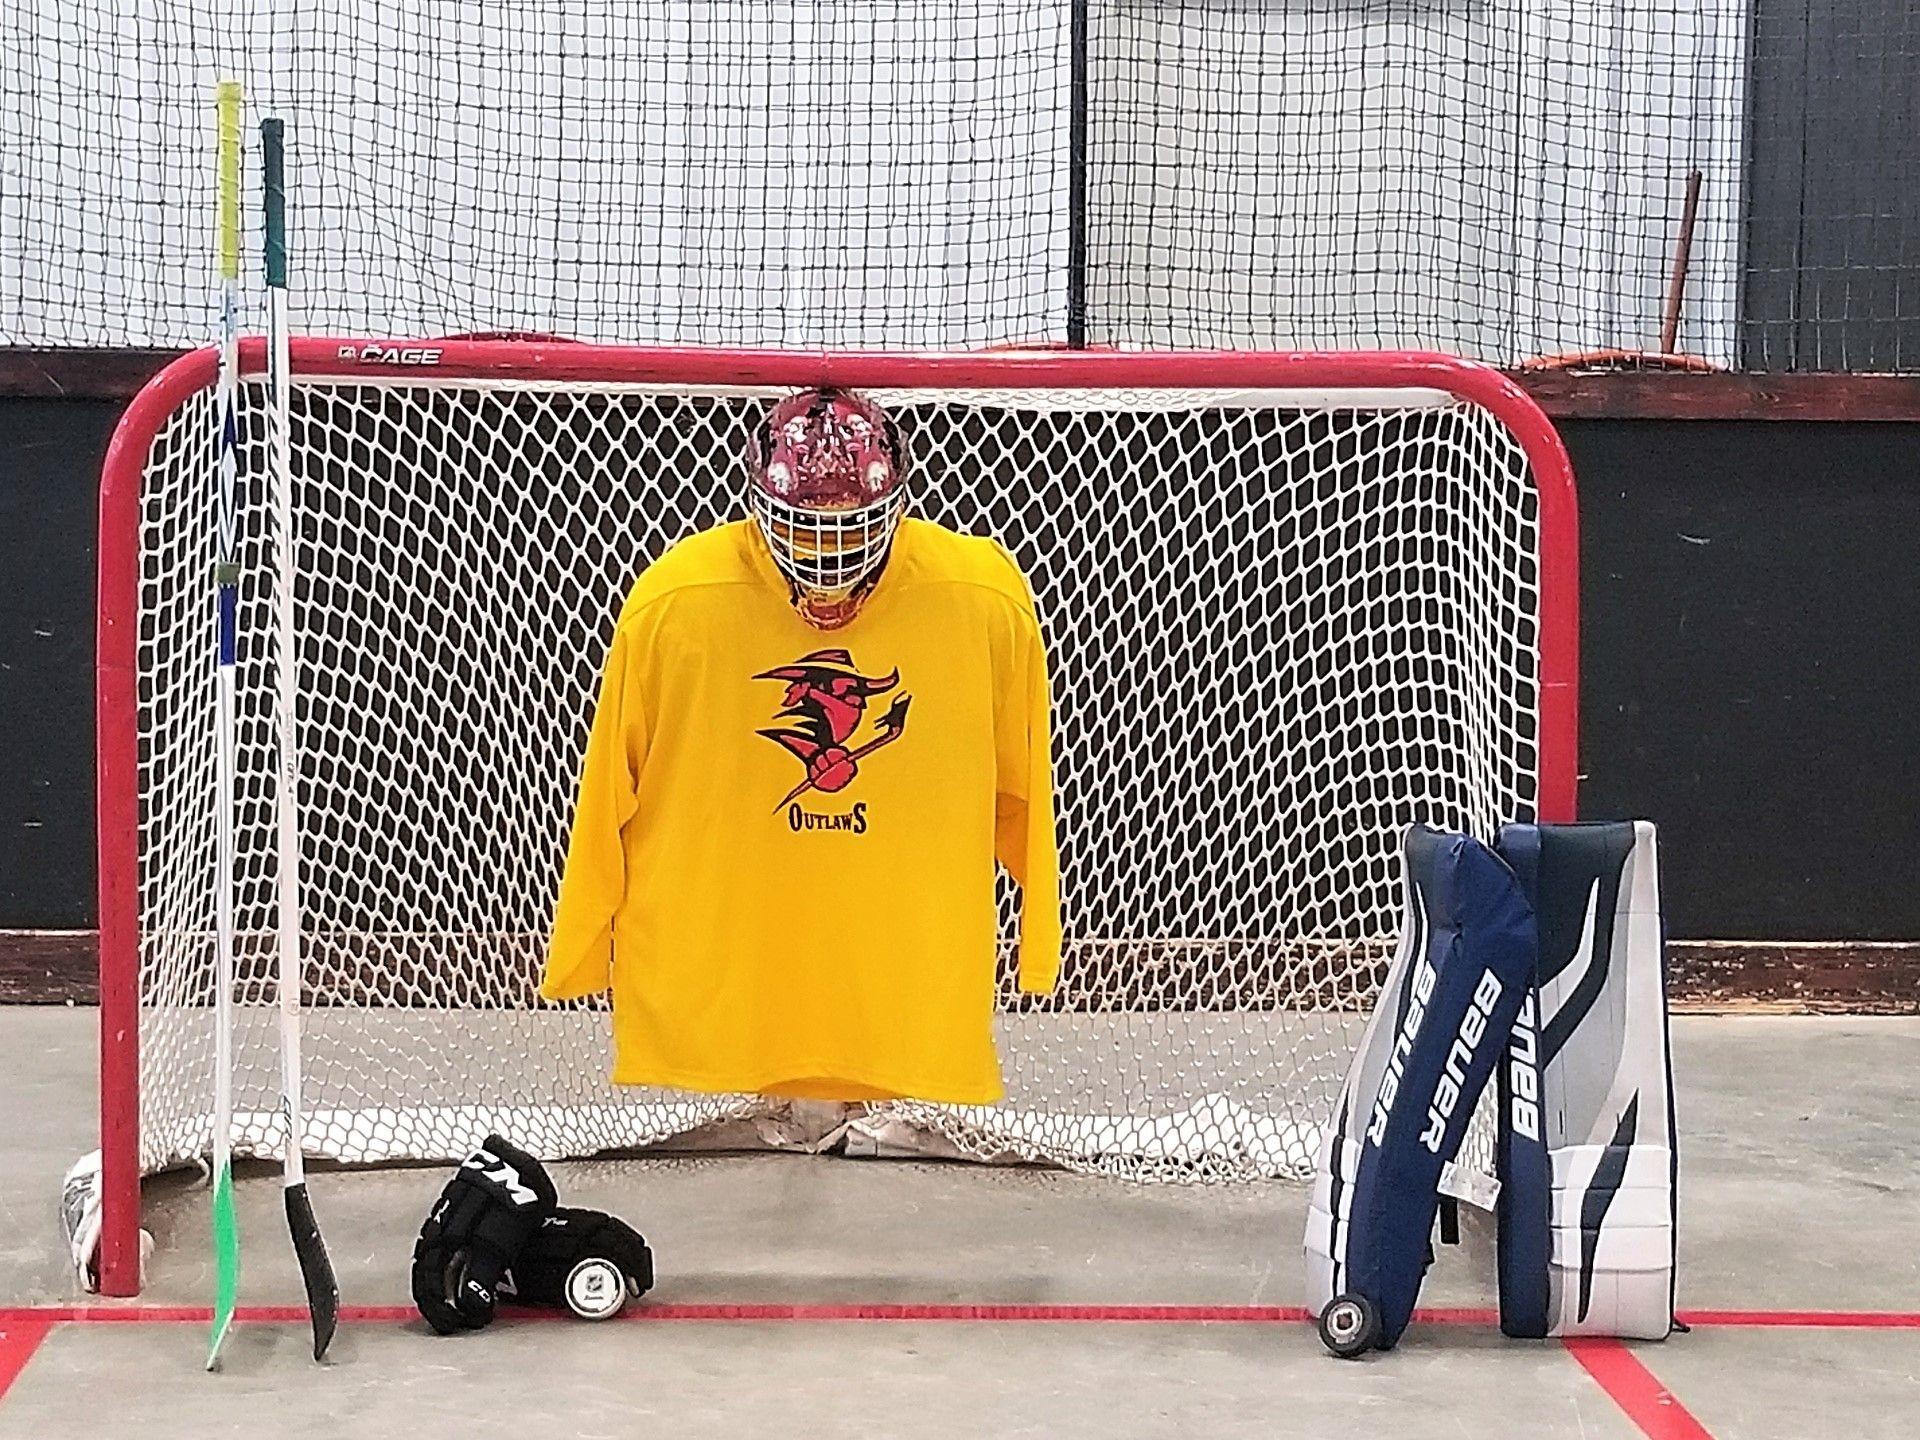 Hockey Gear - Front View 2.jpg